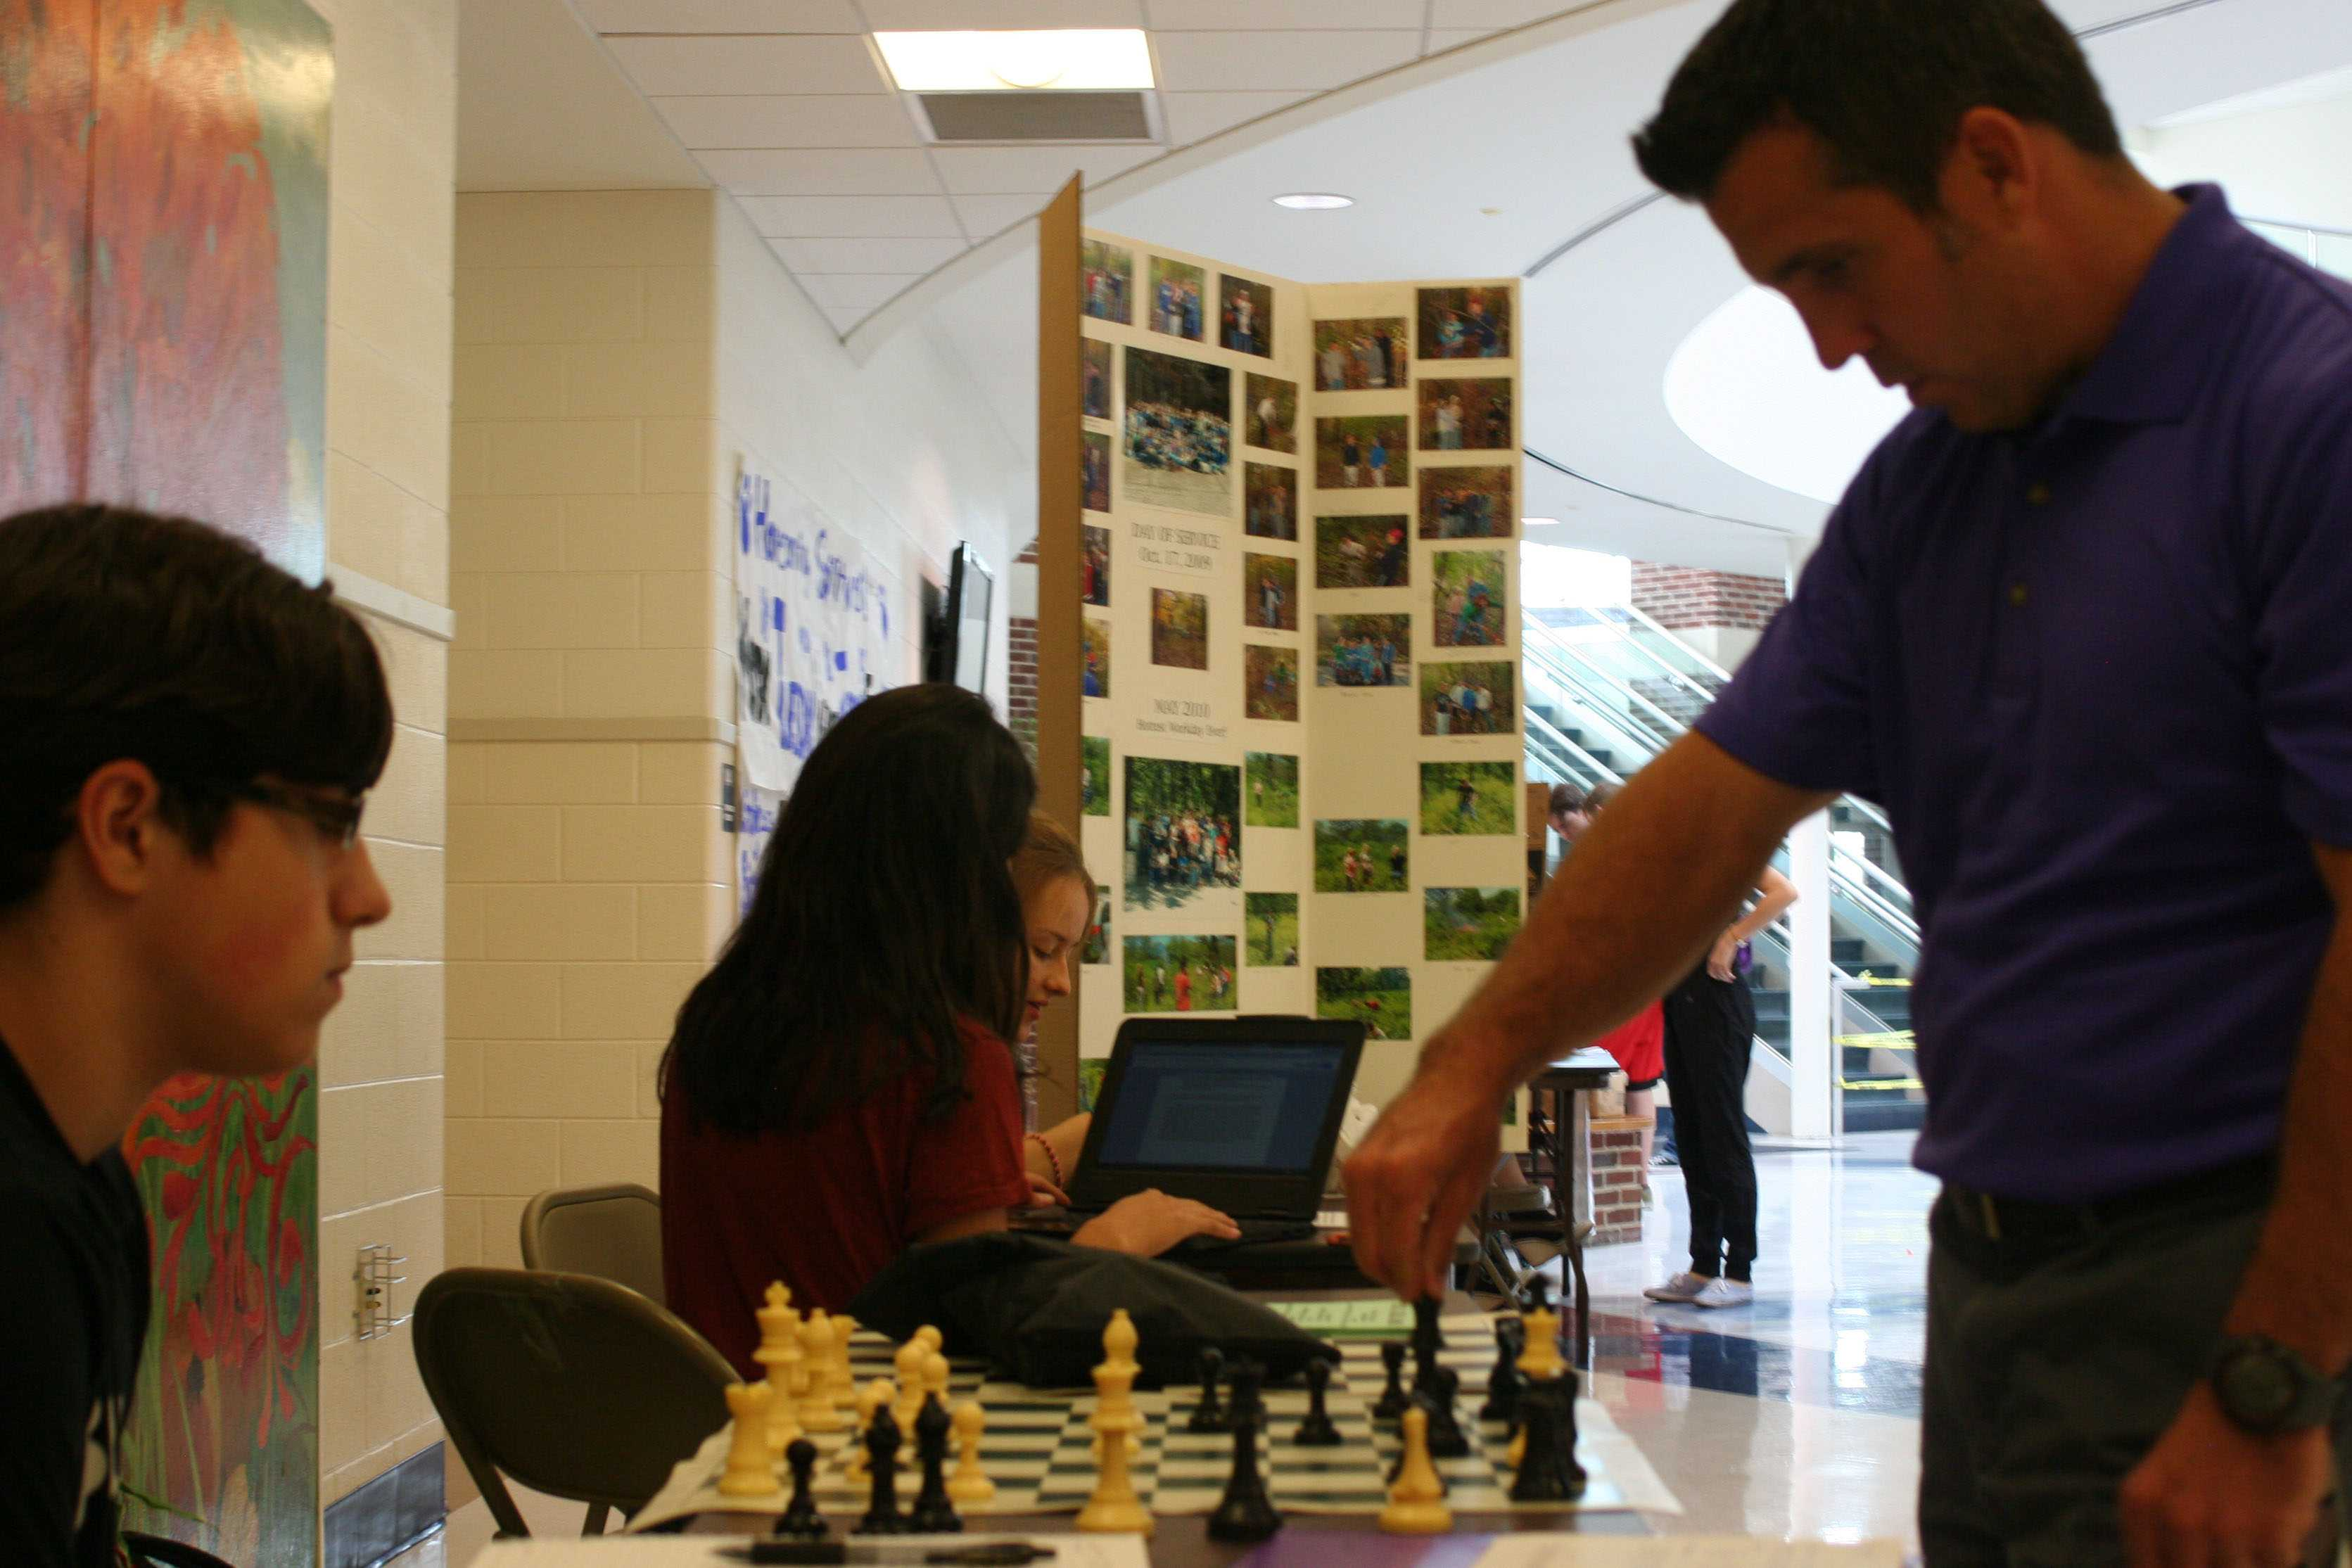 Dean Neil Dughetti and Jackson Hajer play chess at the Chess Club table.